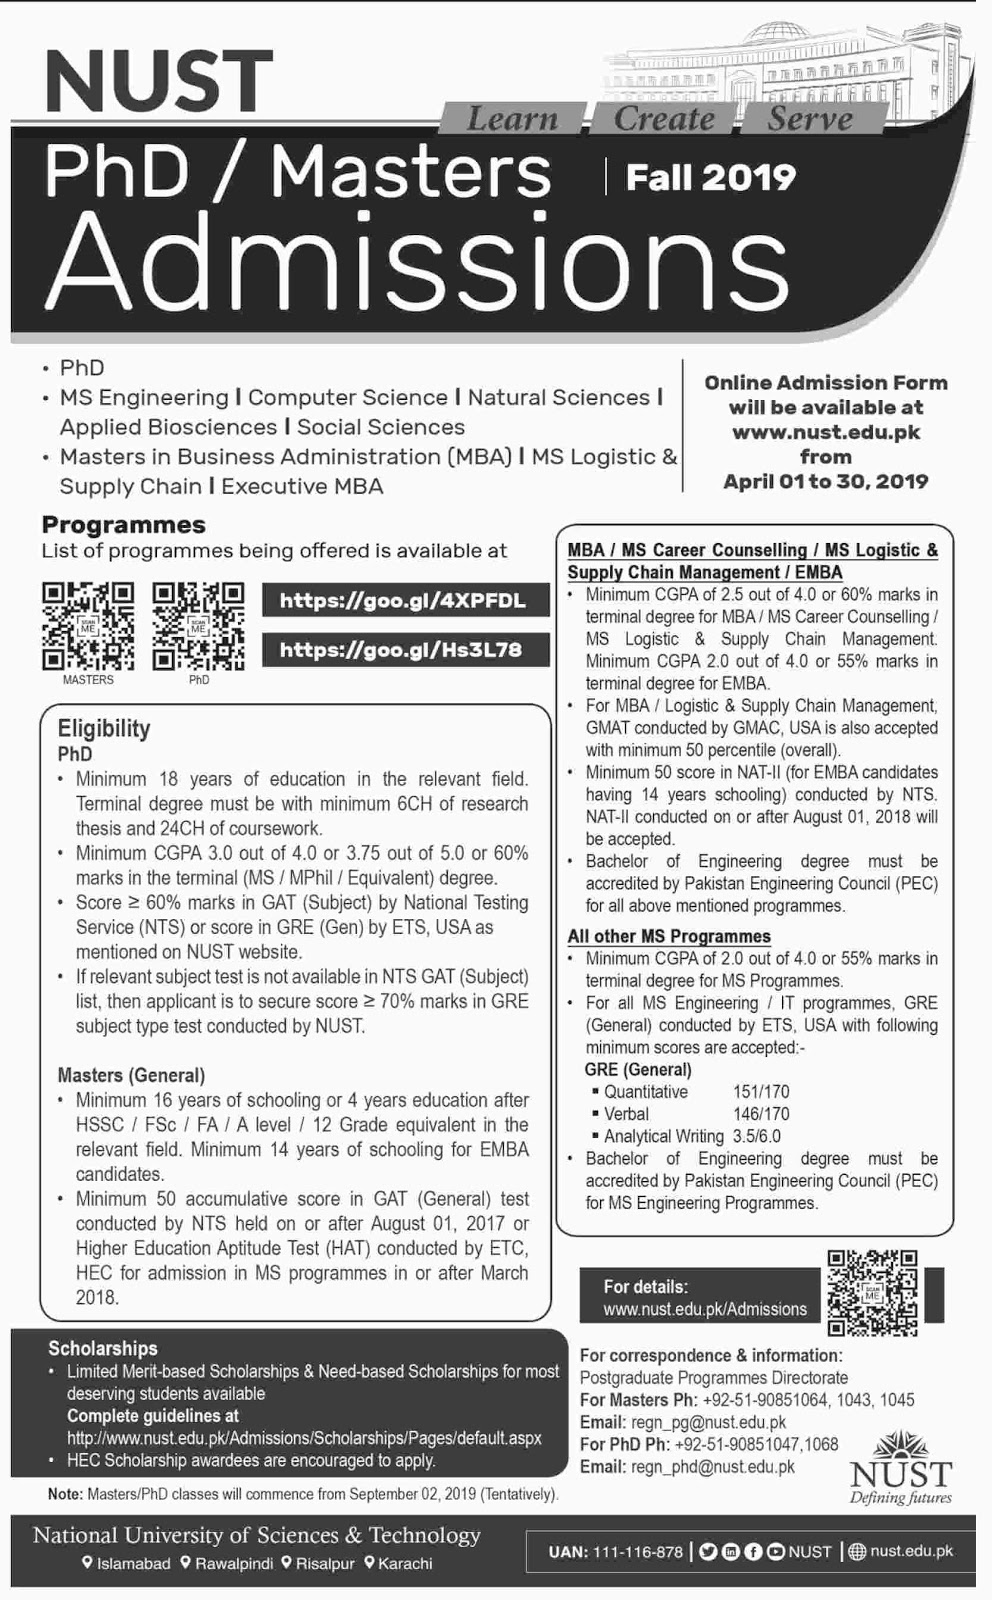 NUST Masters / PhD Admissions Fall 2019 - All Pakistan Exam